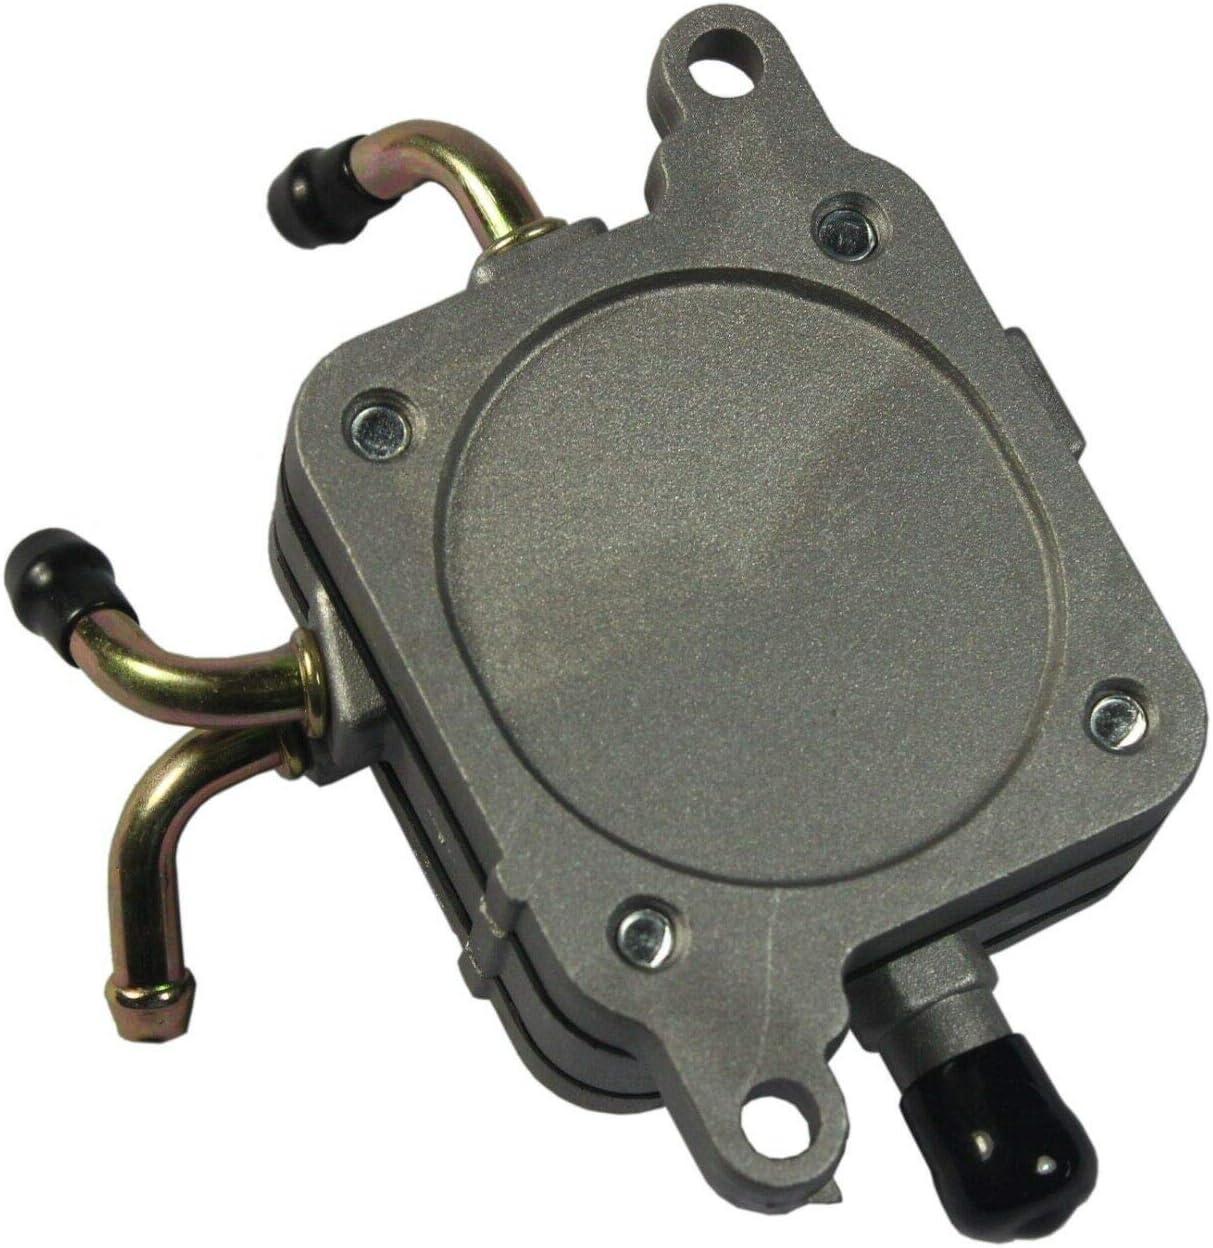 New Fuel Pump 403901200 Replacement For Ski-Doo MXZ Summit Formula 583 670 Mach1